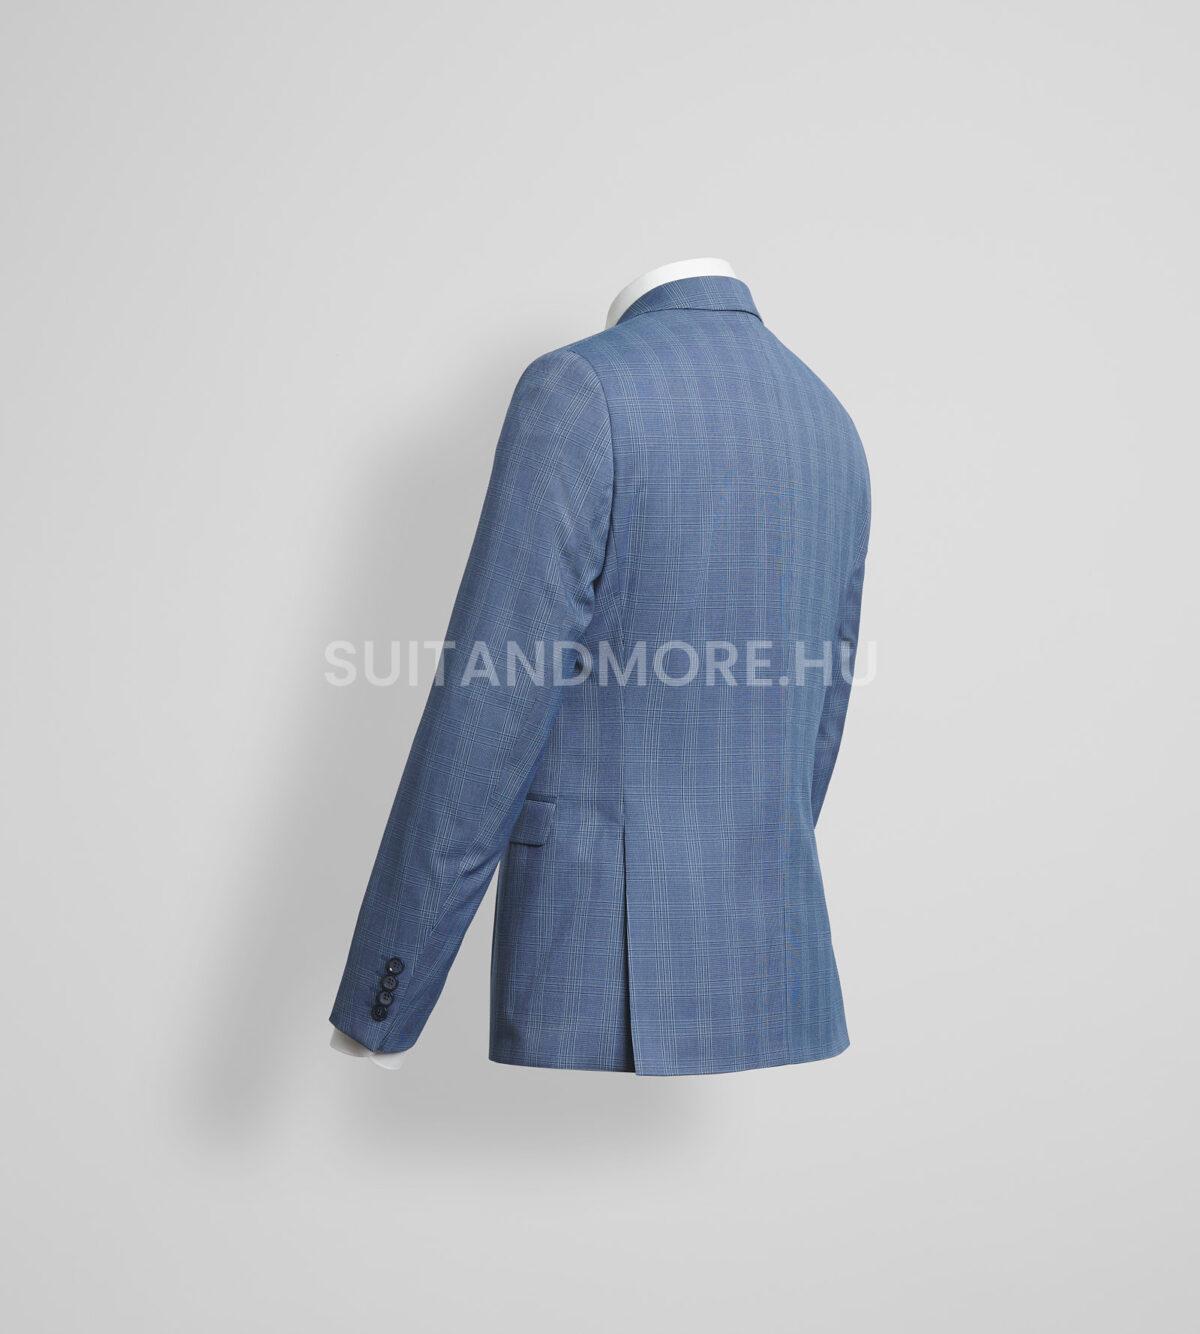 DIGEL-Move-kék-extra-slim-fit-kockás-zakó-NANNO-NATE-NICOLO-99727-25-03